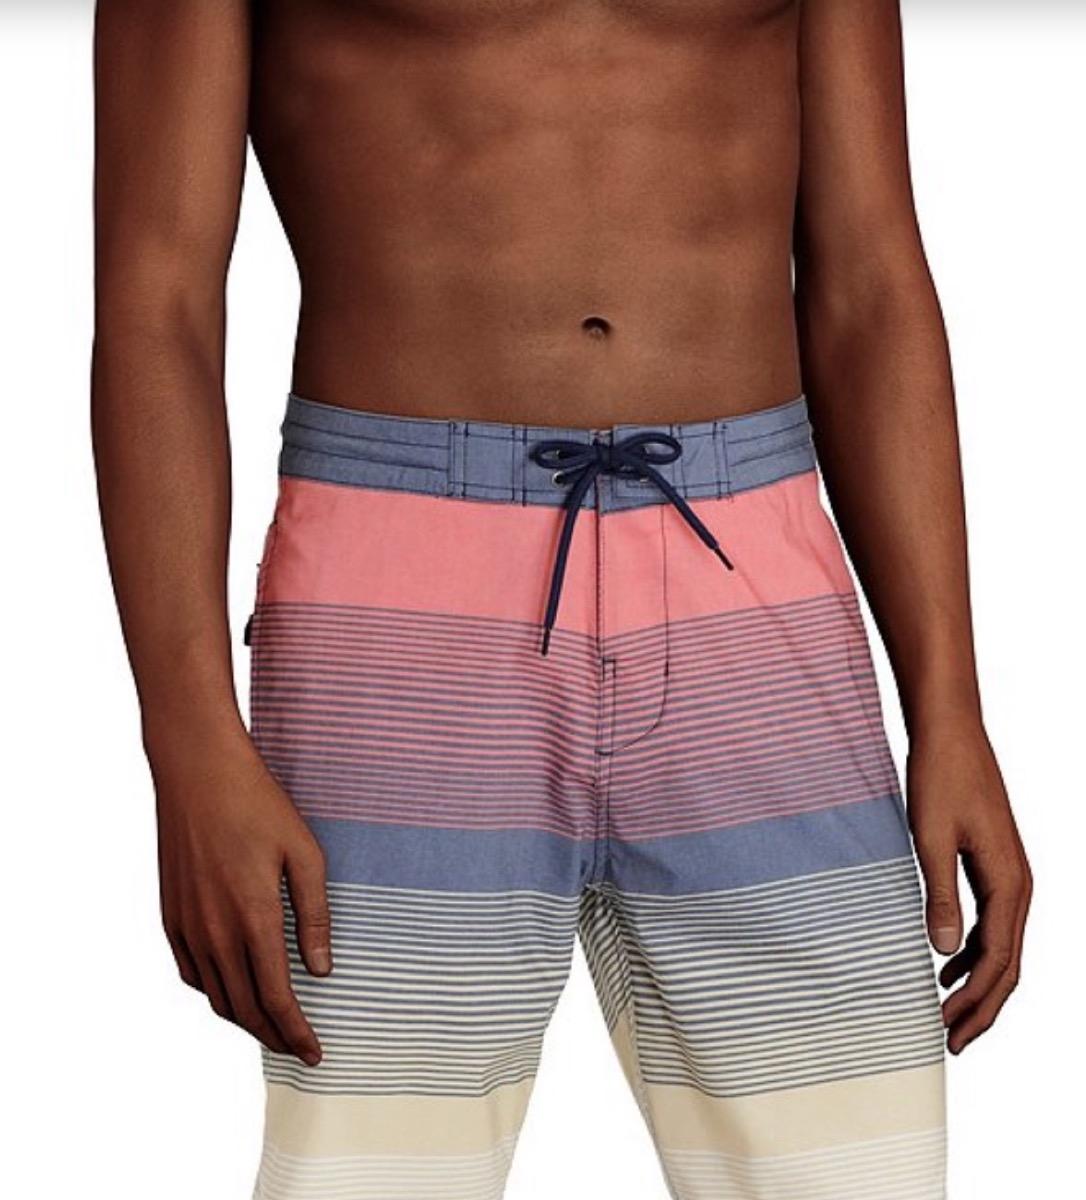 striped board shorts, cheap swimsuits